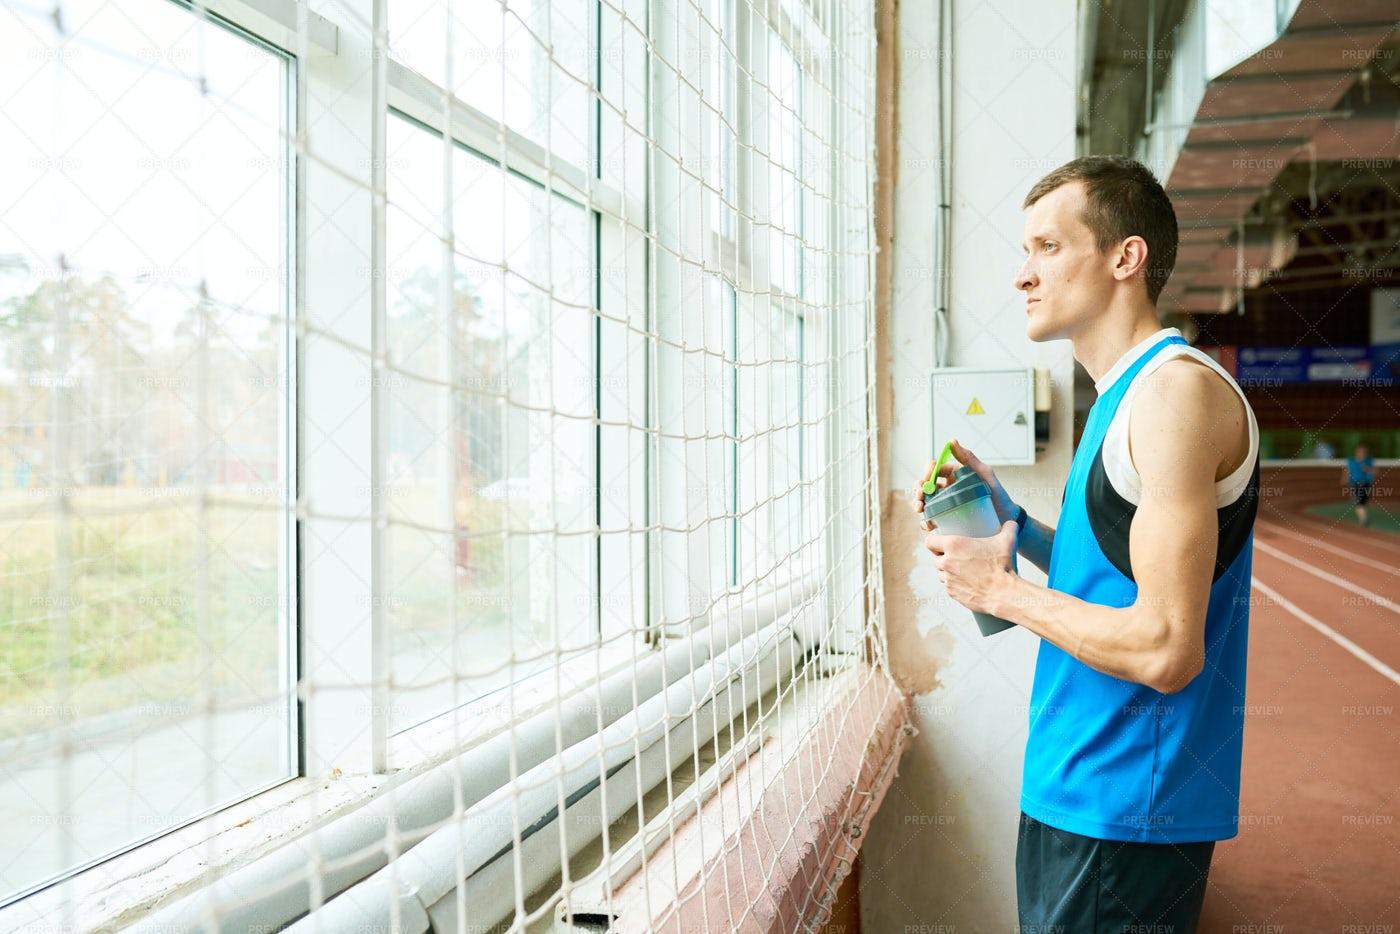 Pensive Sportsman By Window: Stock Photos